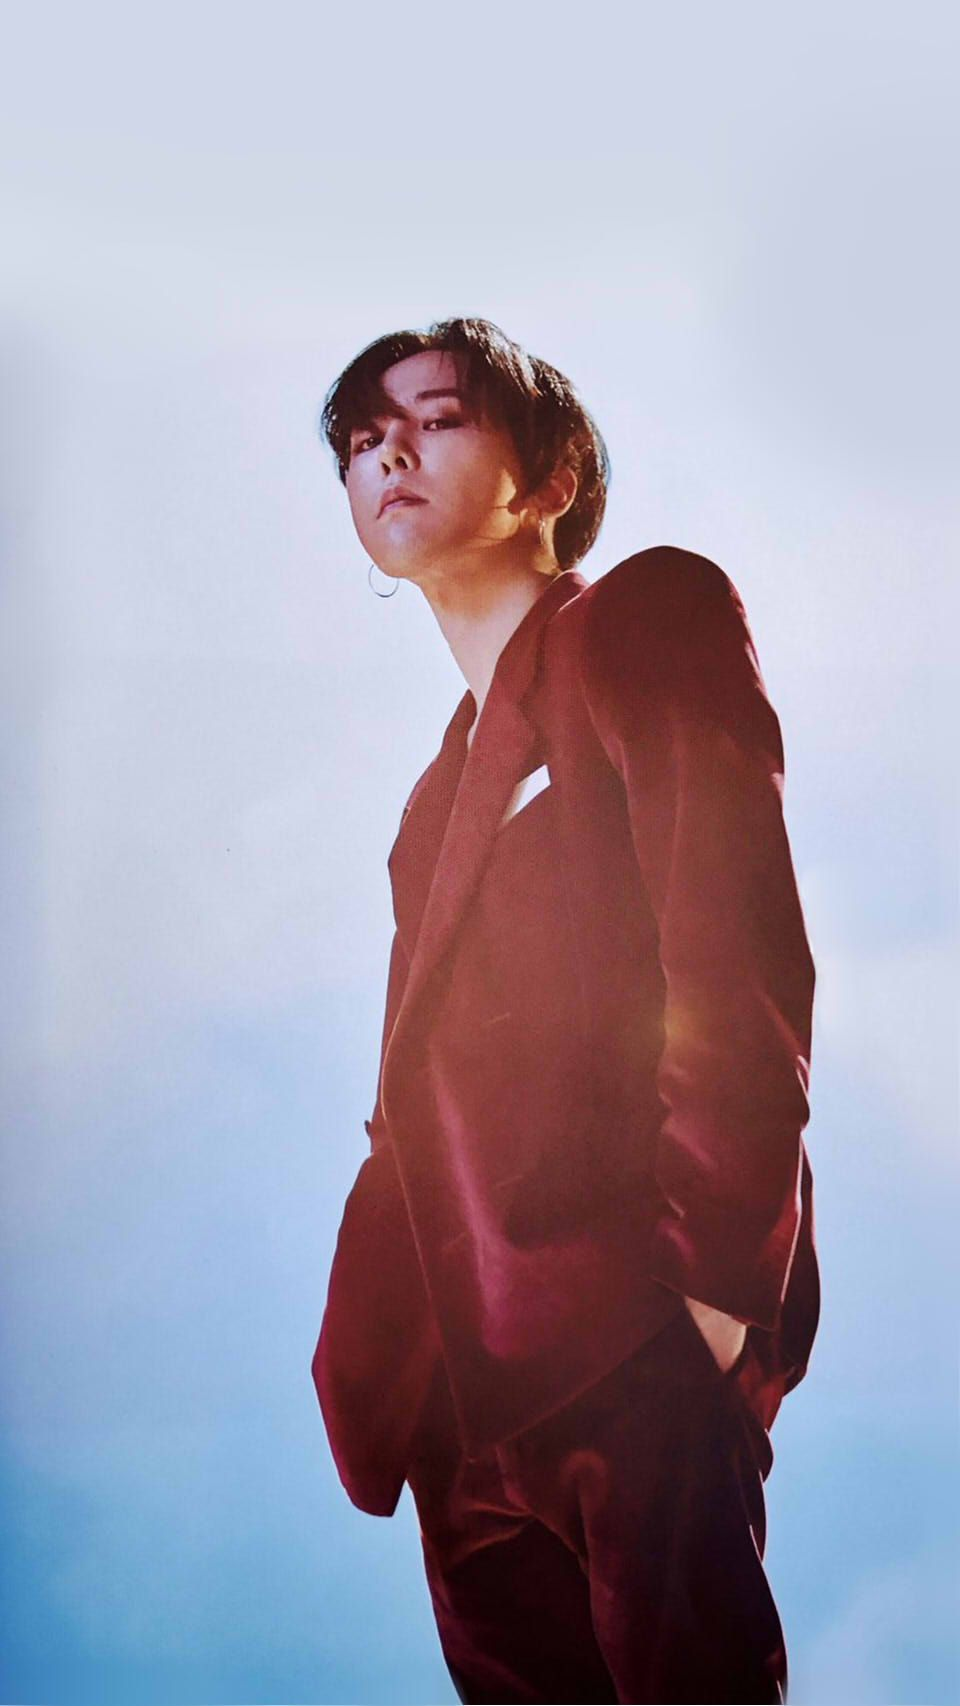 G-Dragon | BigBang Wallpaper iPhone #gdragon | k-pop | Pinterest